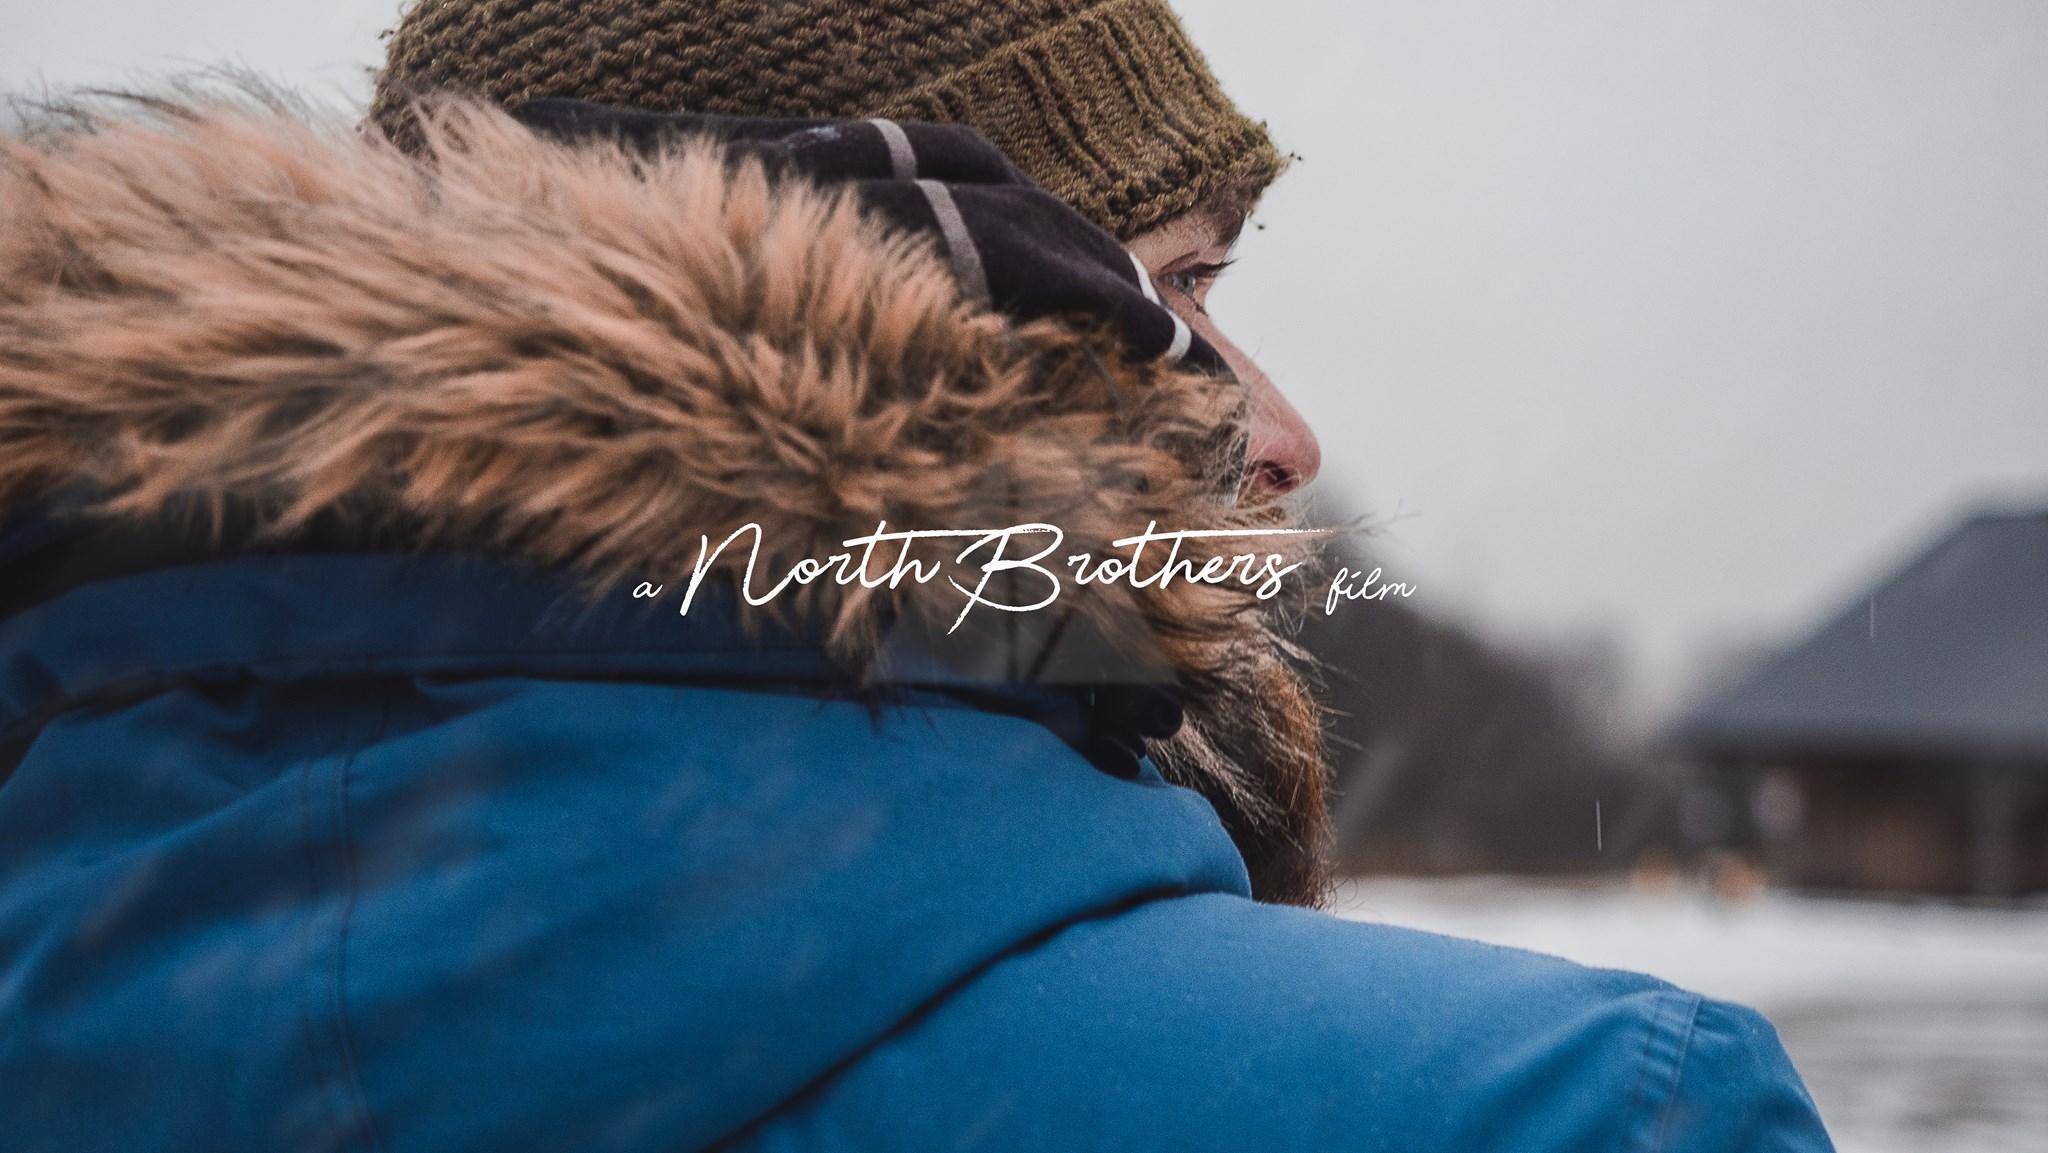 northbrothers.jpg